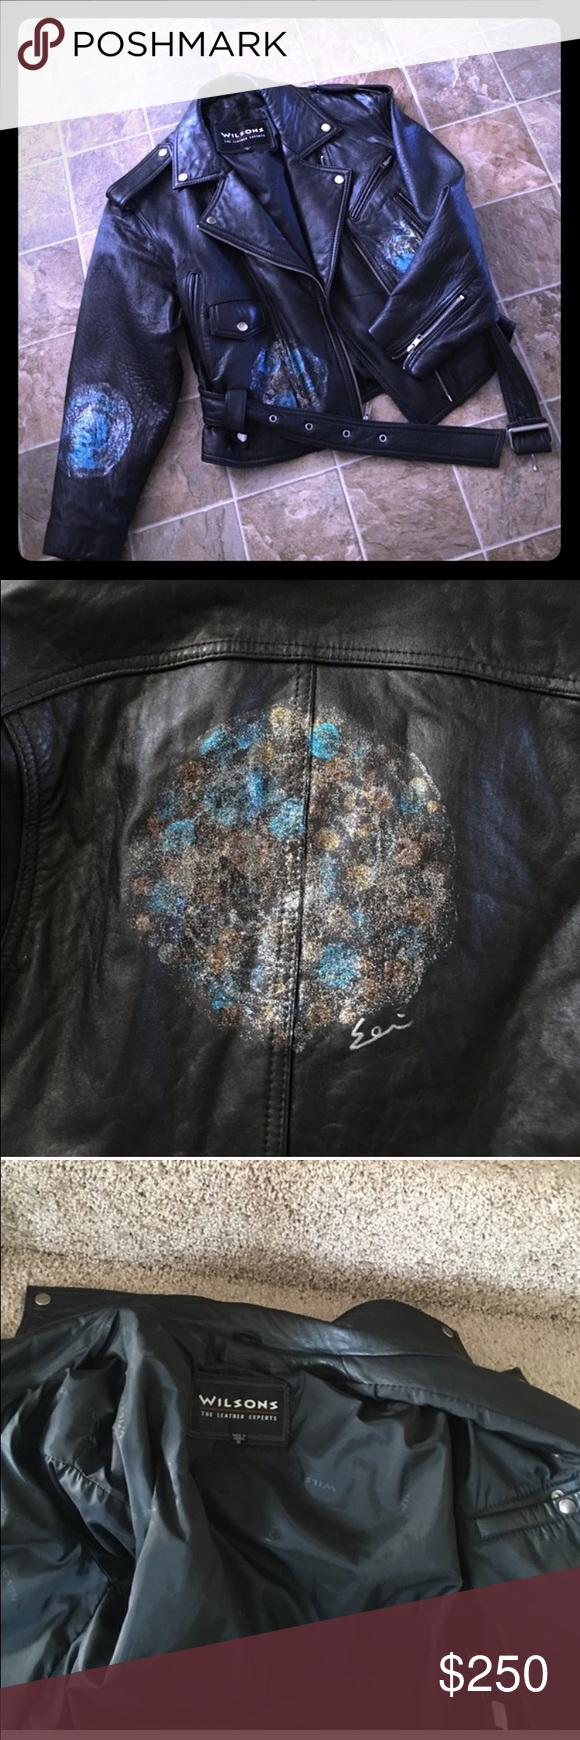 Wilsons leather jacket Wilsons leather jacket, Wilsons